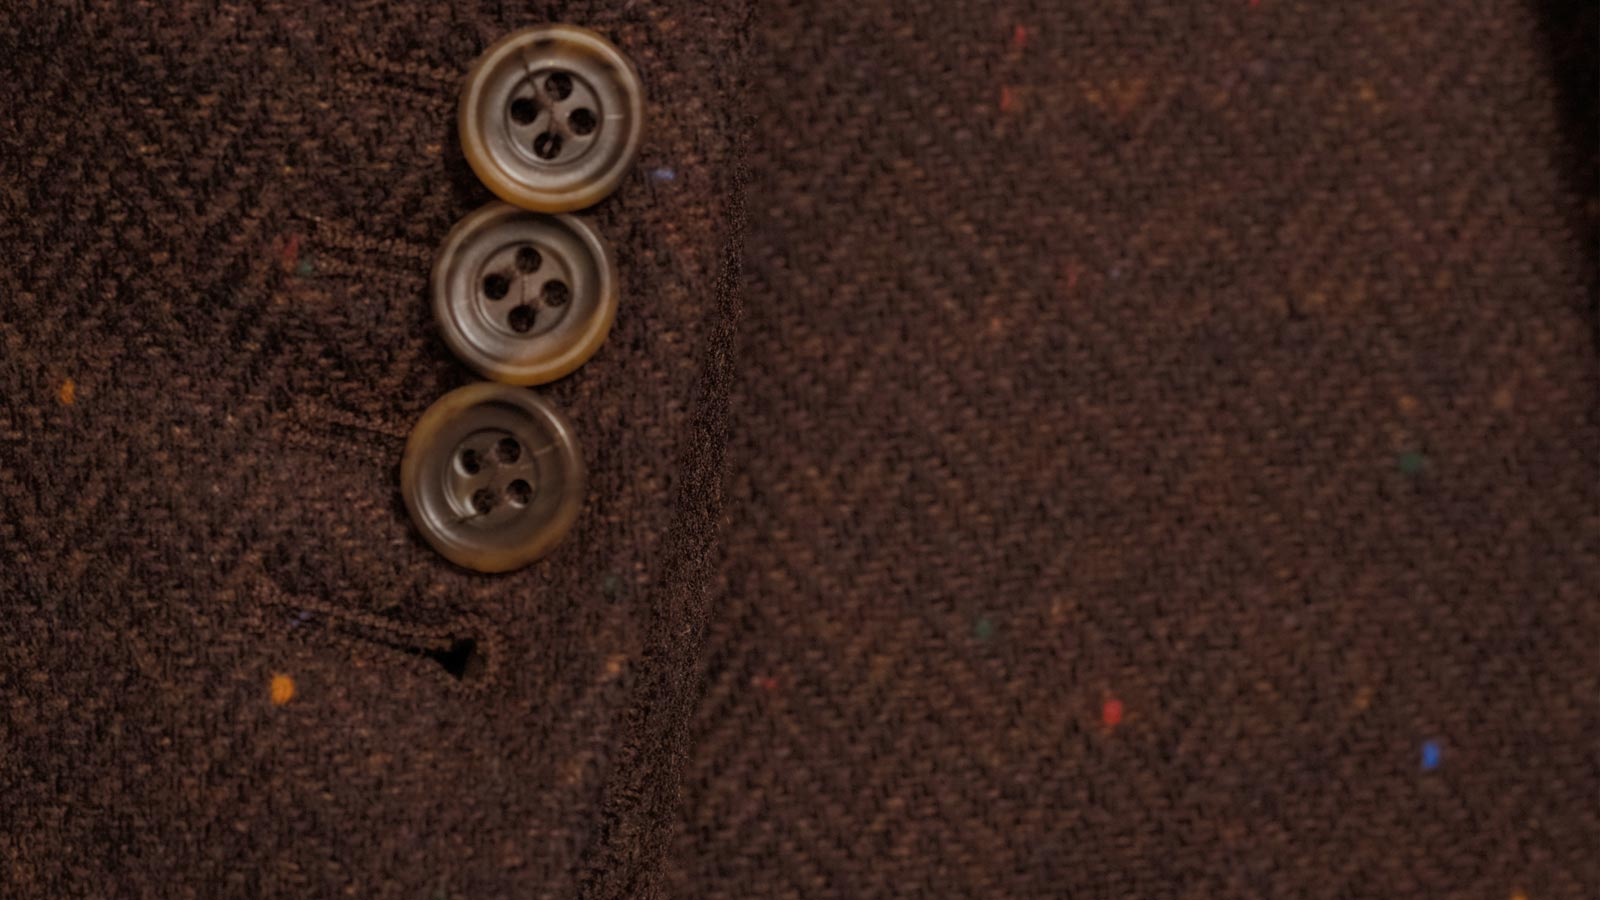 Rich Tobacco Donegal Herringbone Tweed Blazer - slider image 1